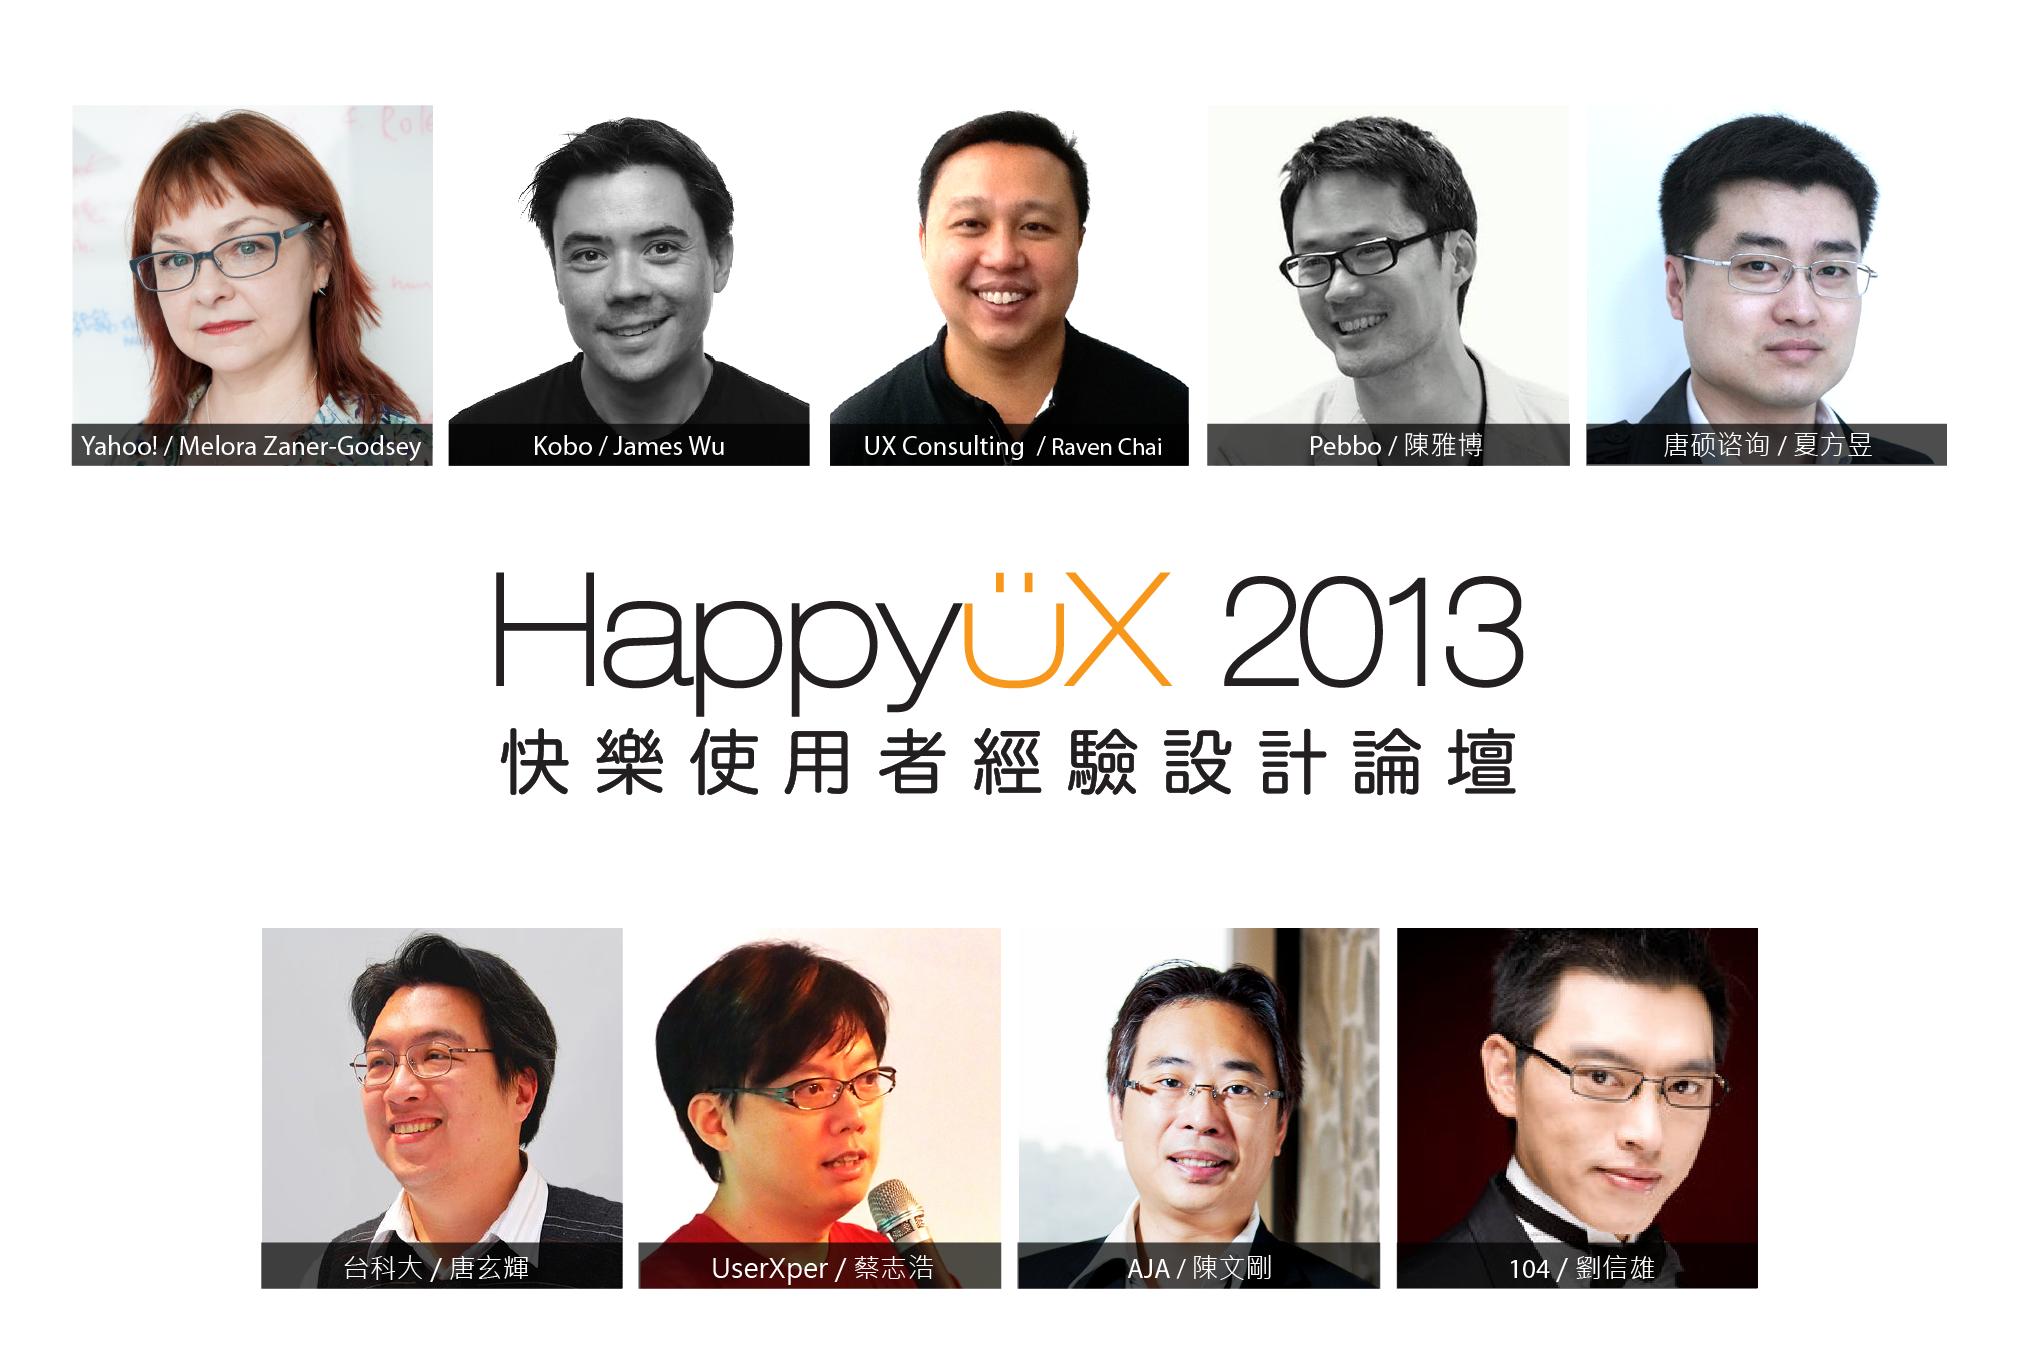 Happy UX 2013 快樂使用者經驗設計論壇